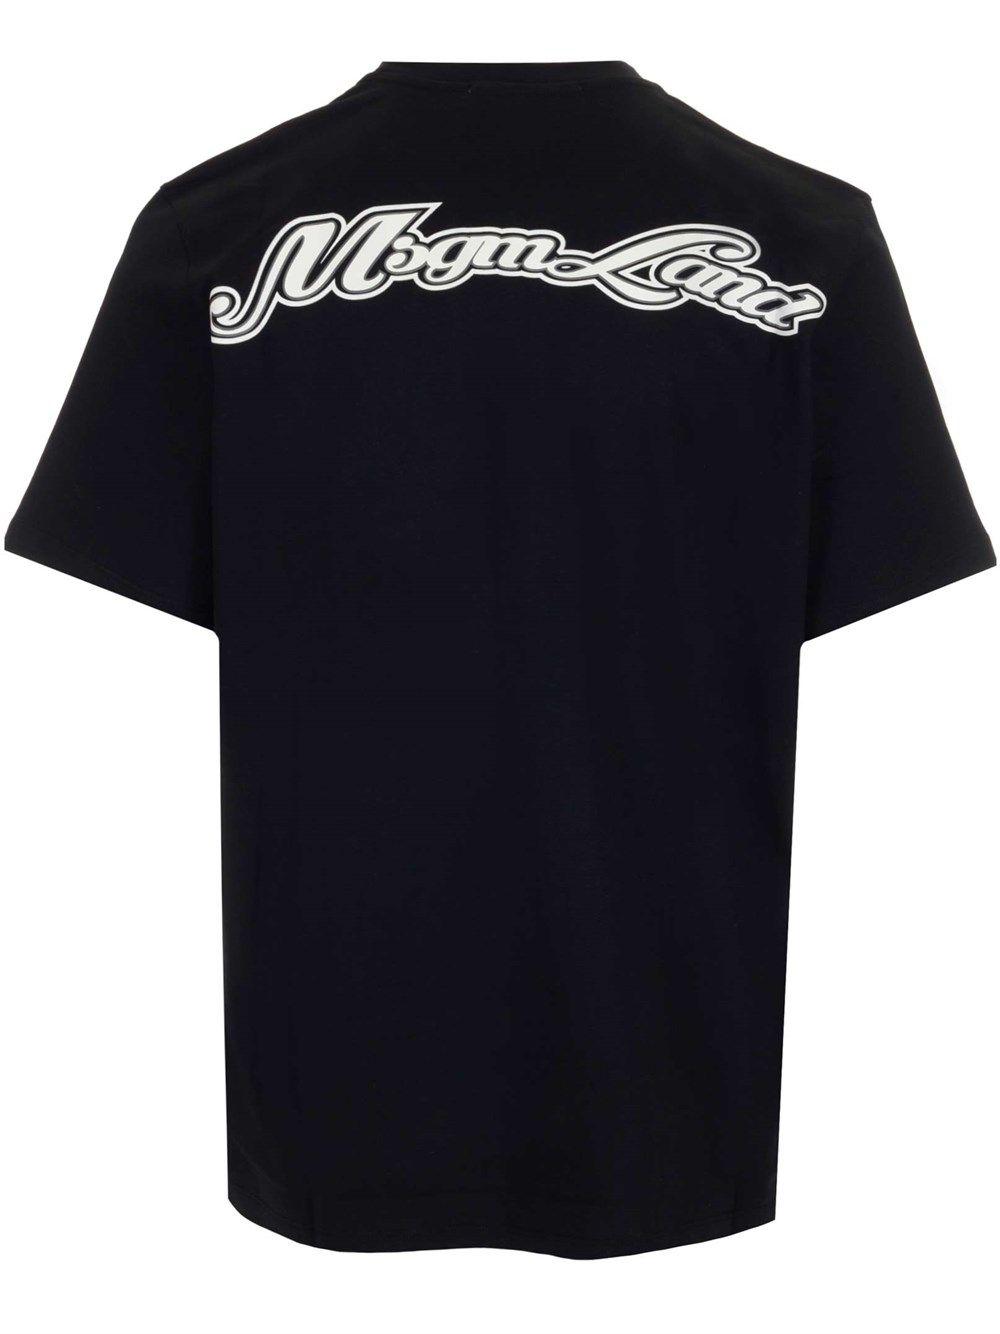 MSGM Cottons MSGM MEN'S BLACK OTHER MATERIALS T-SHIRT